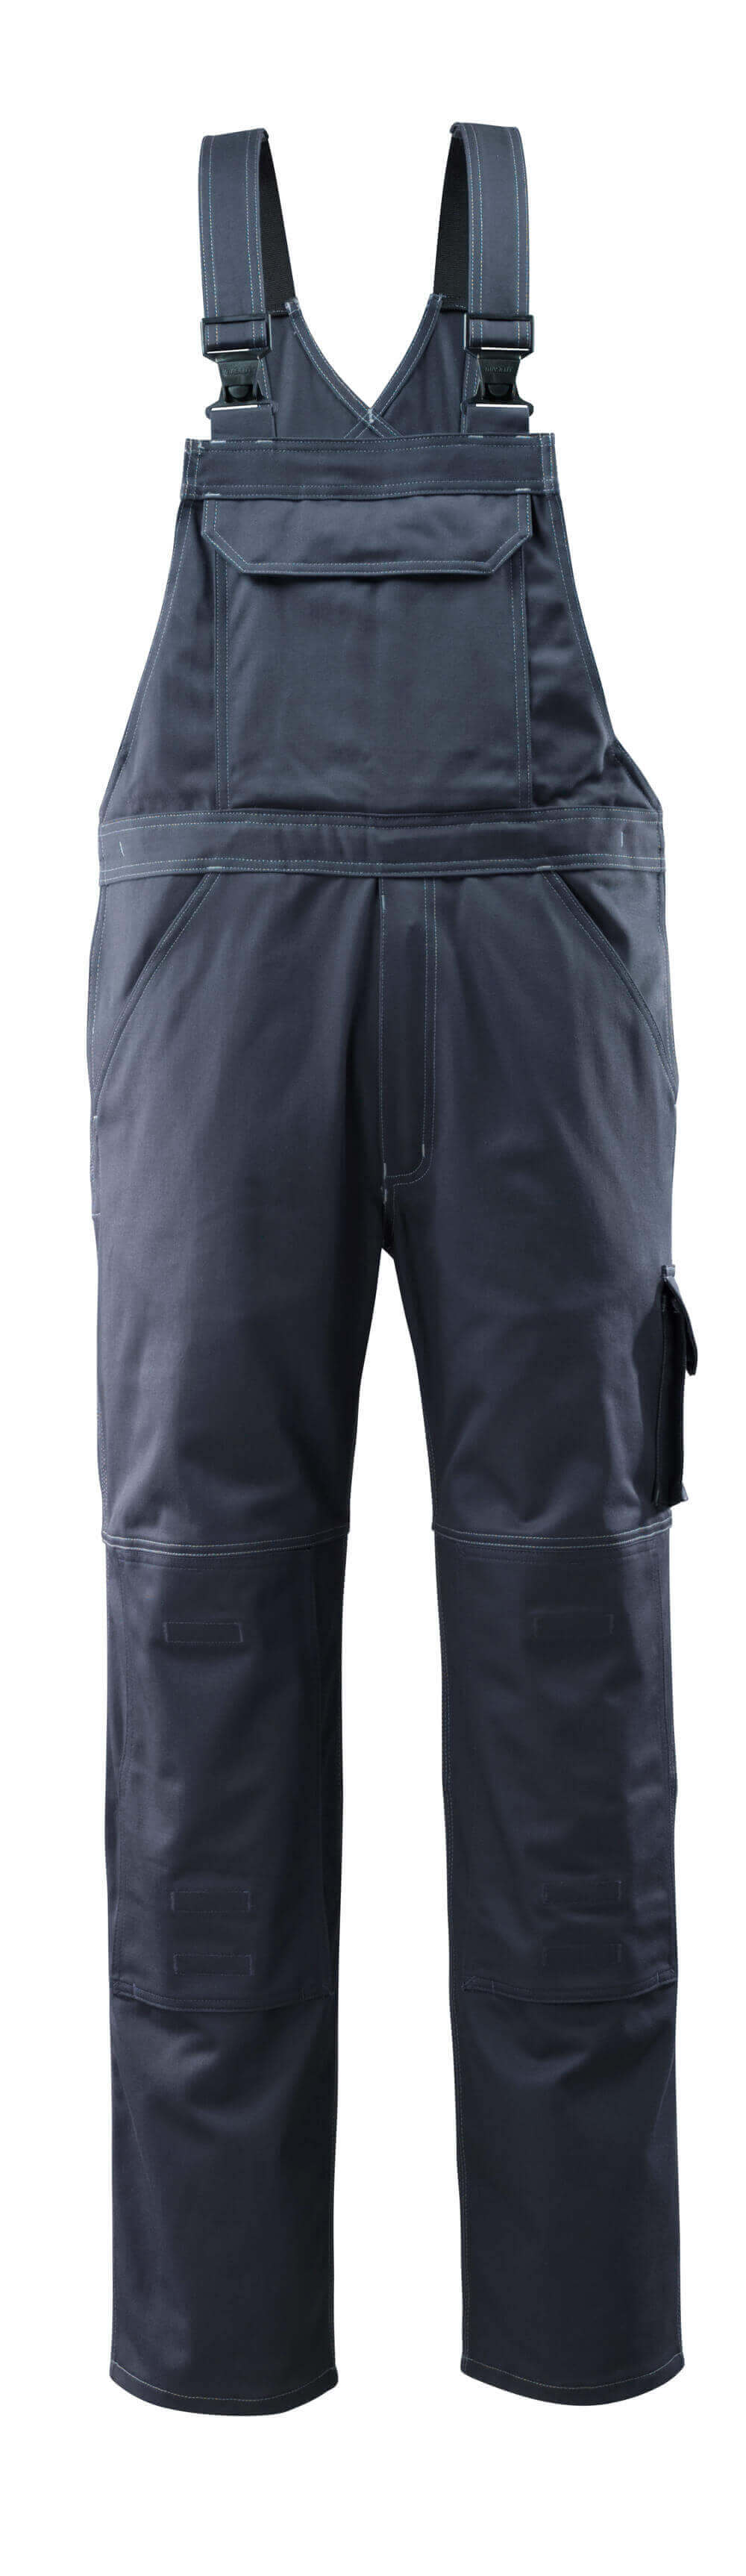 12362-630-010 Amerikaanse overall met kniezakken - donkermarine